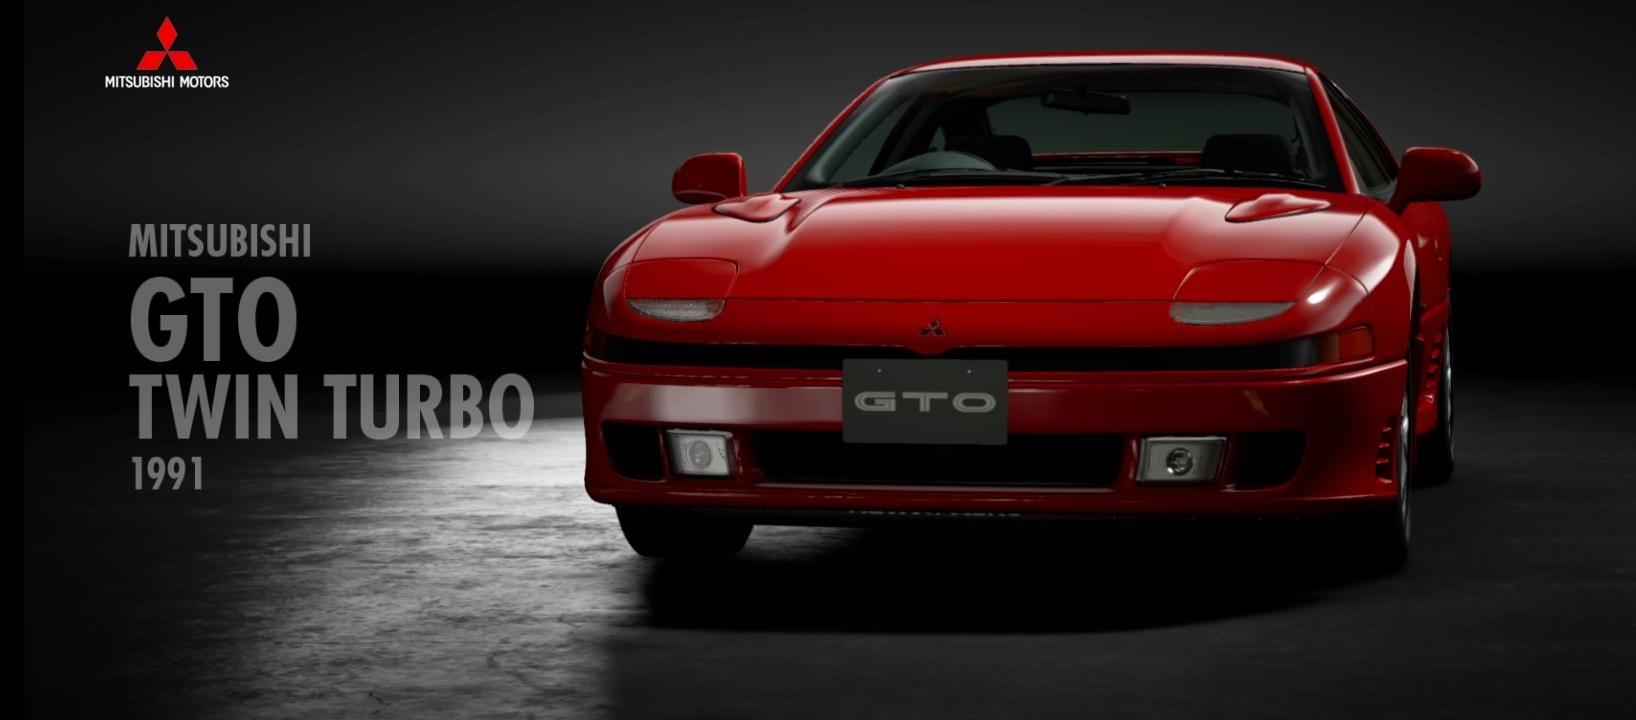 [Immagine: GTO.jpg]